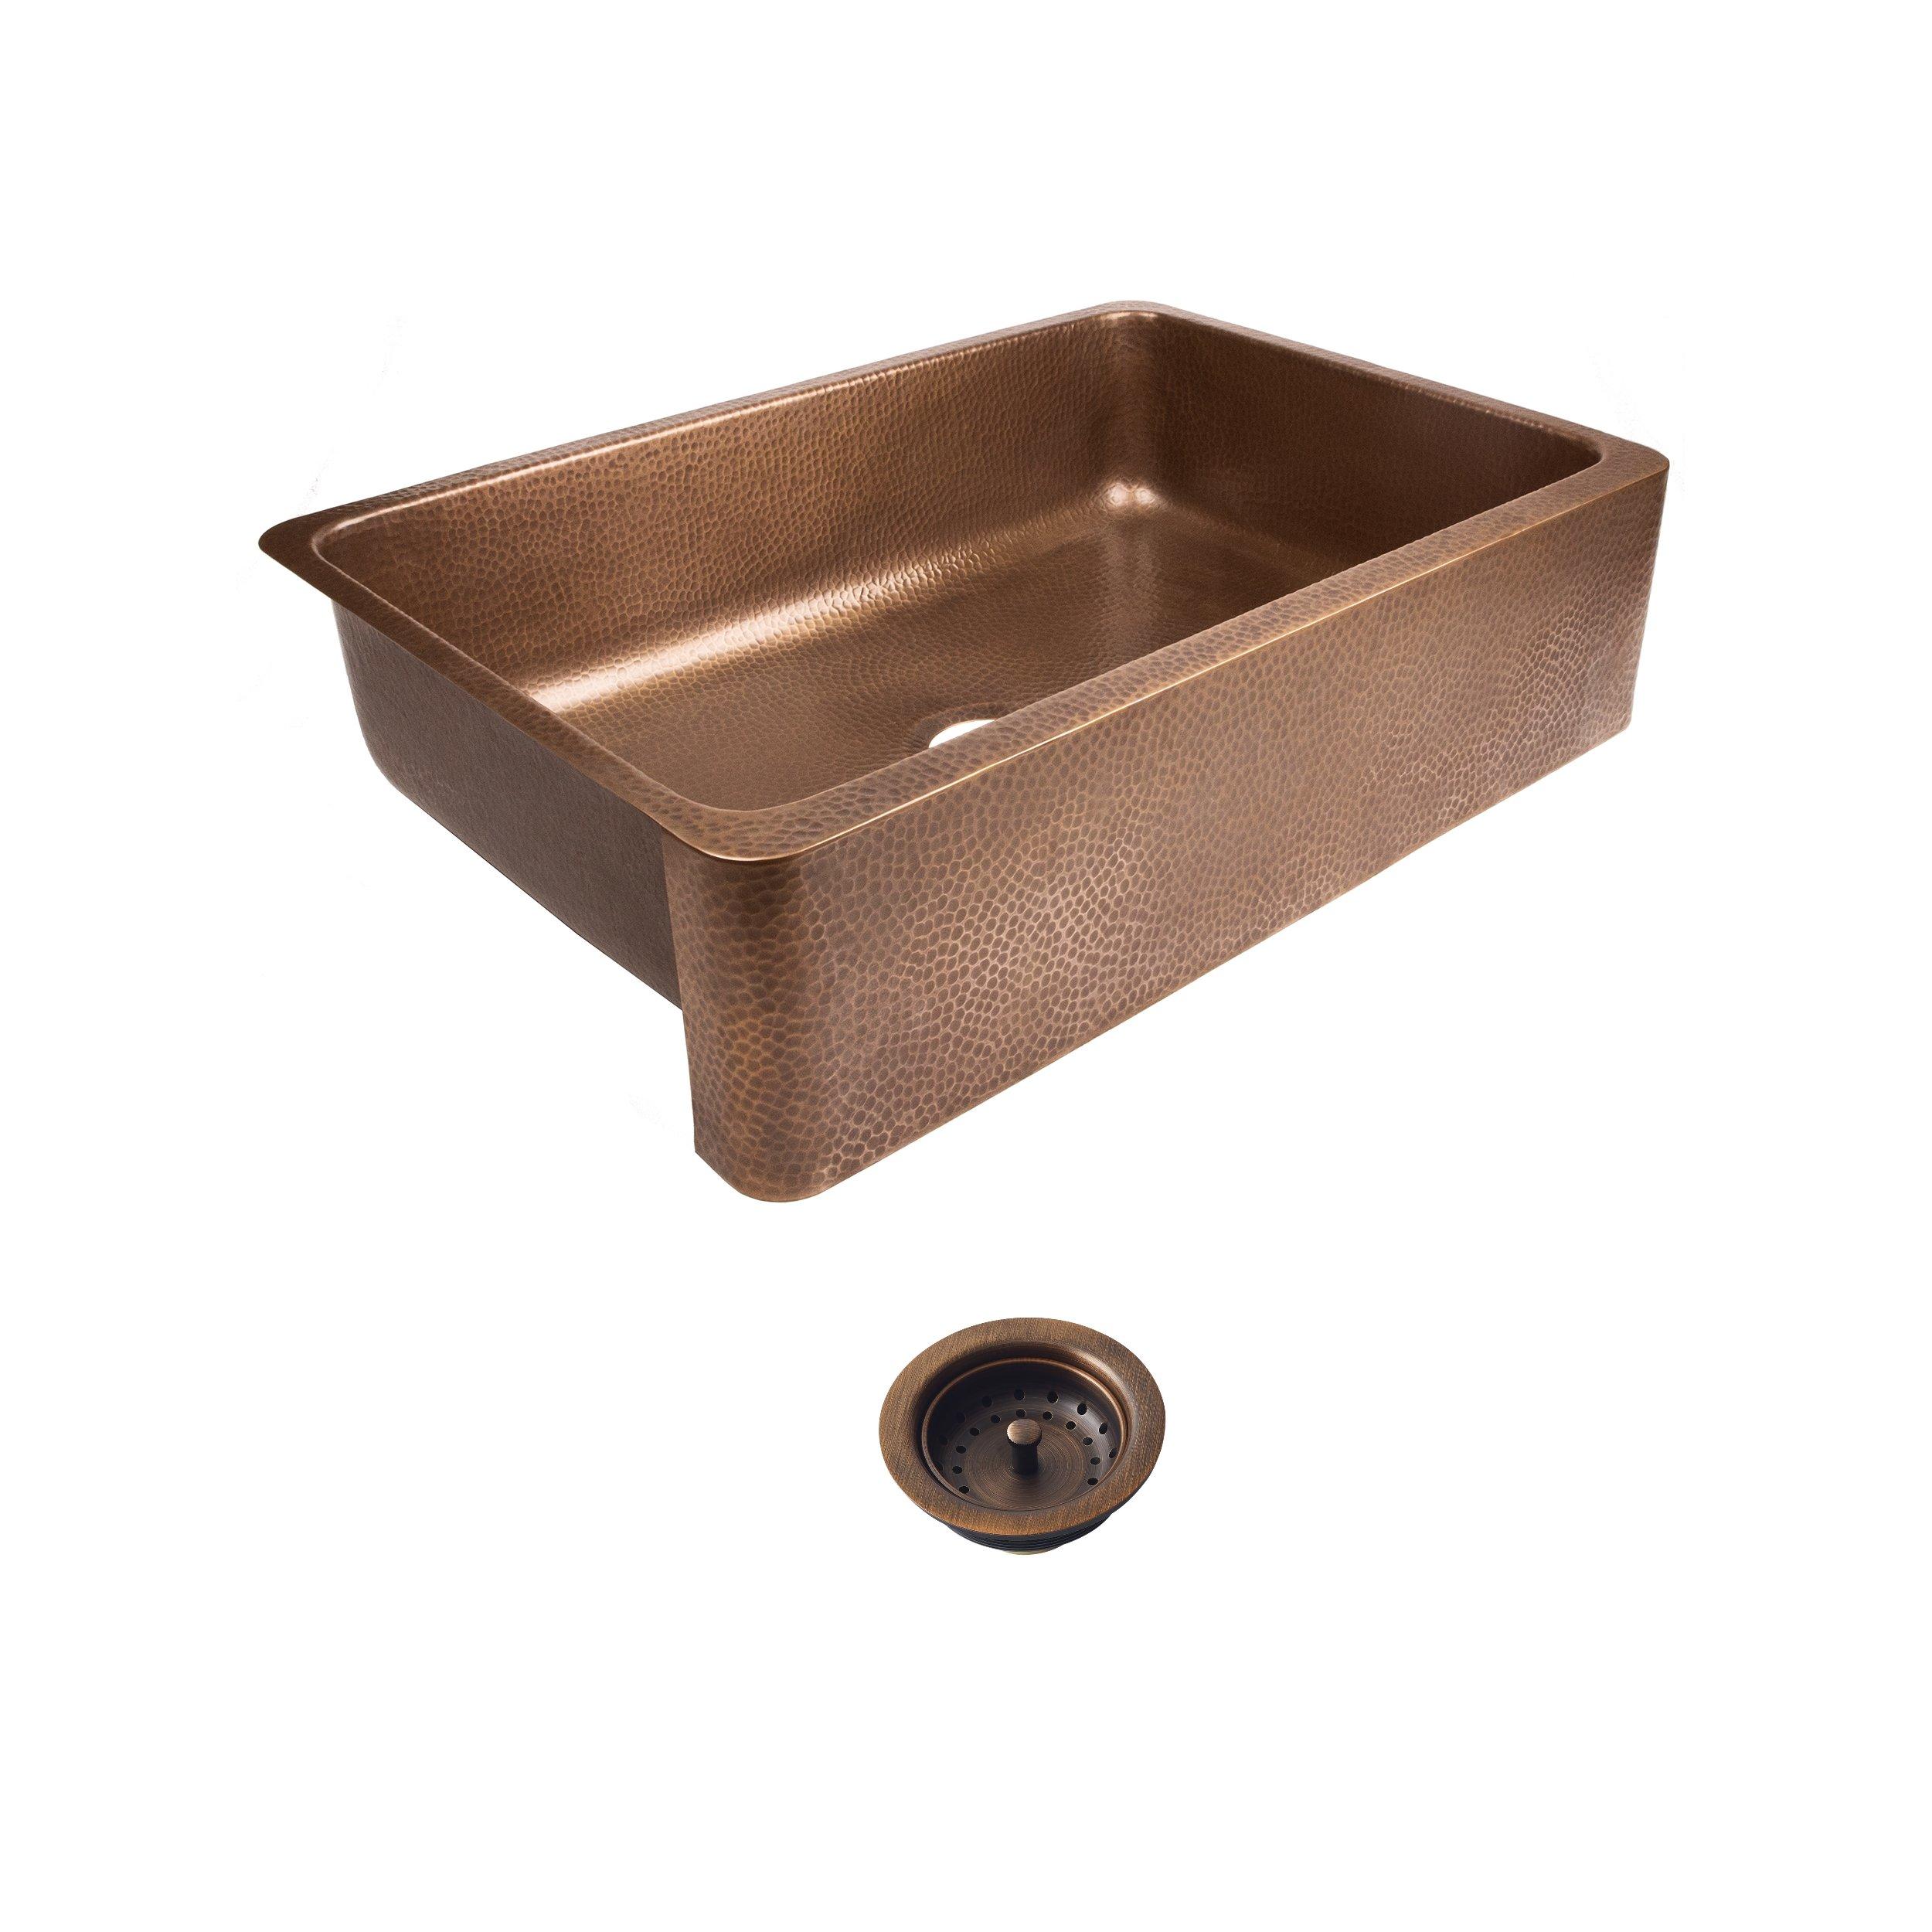 Sinkology SEK307-33-AMZ-B Lange Farmhouse Copper 32 in. Single Bowl Strainer Kitchen Sink with Drain, Antique